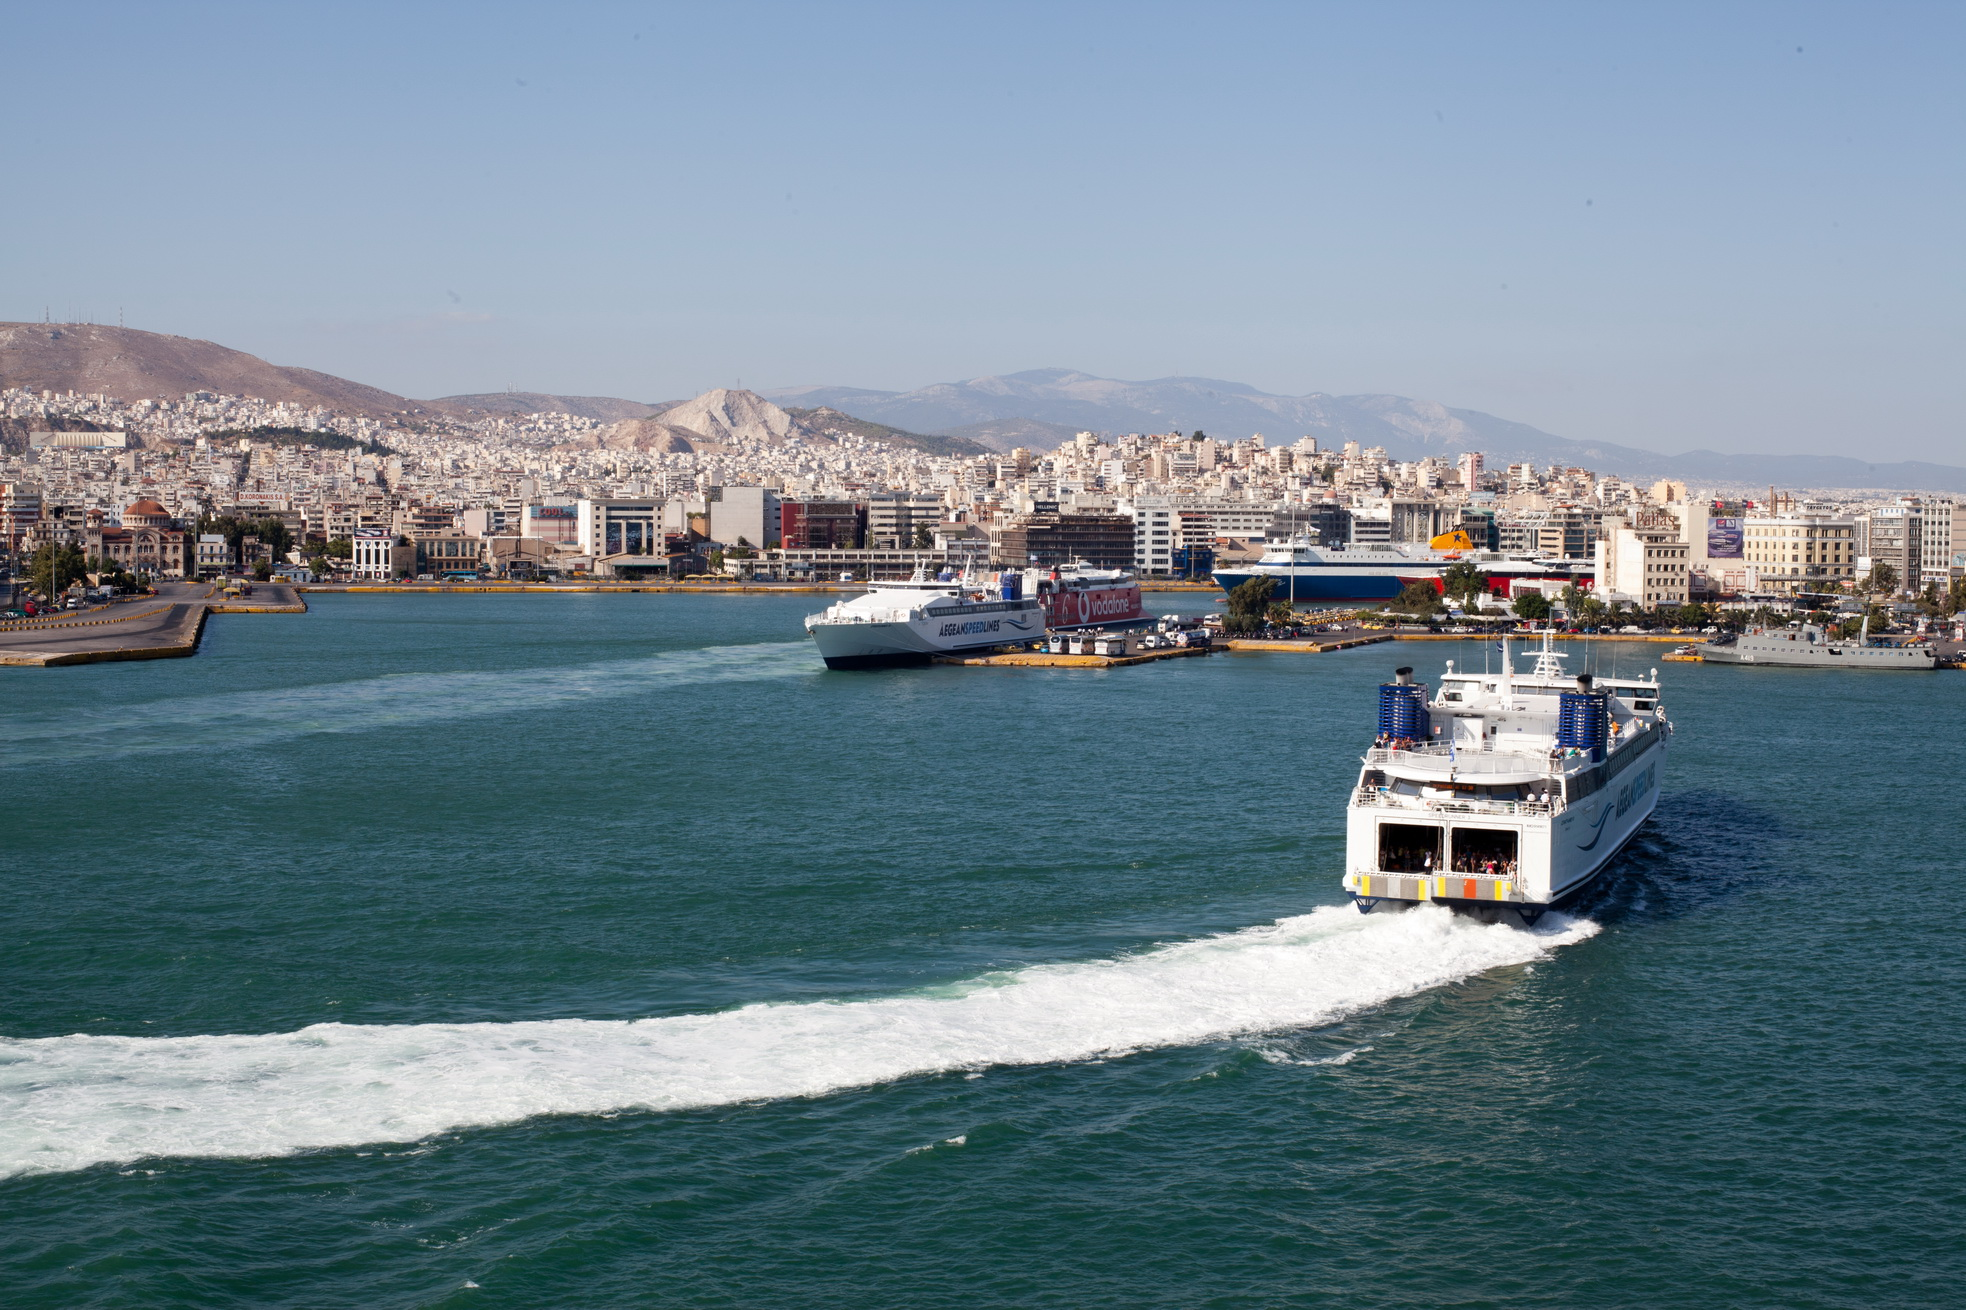 MS Speedrunner III IMO 9141871 Aegean Speed Lines entering Piraeus Port of Athens Greece 04